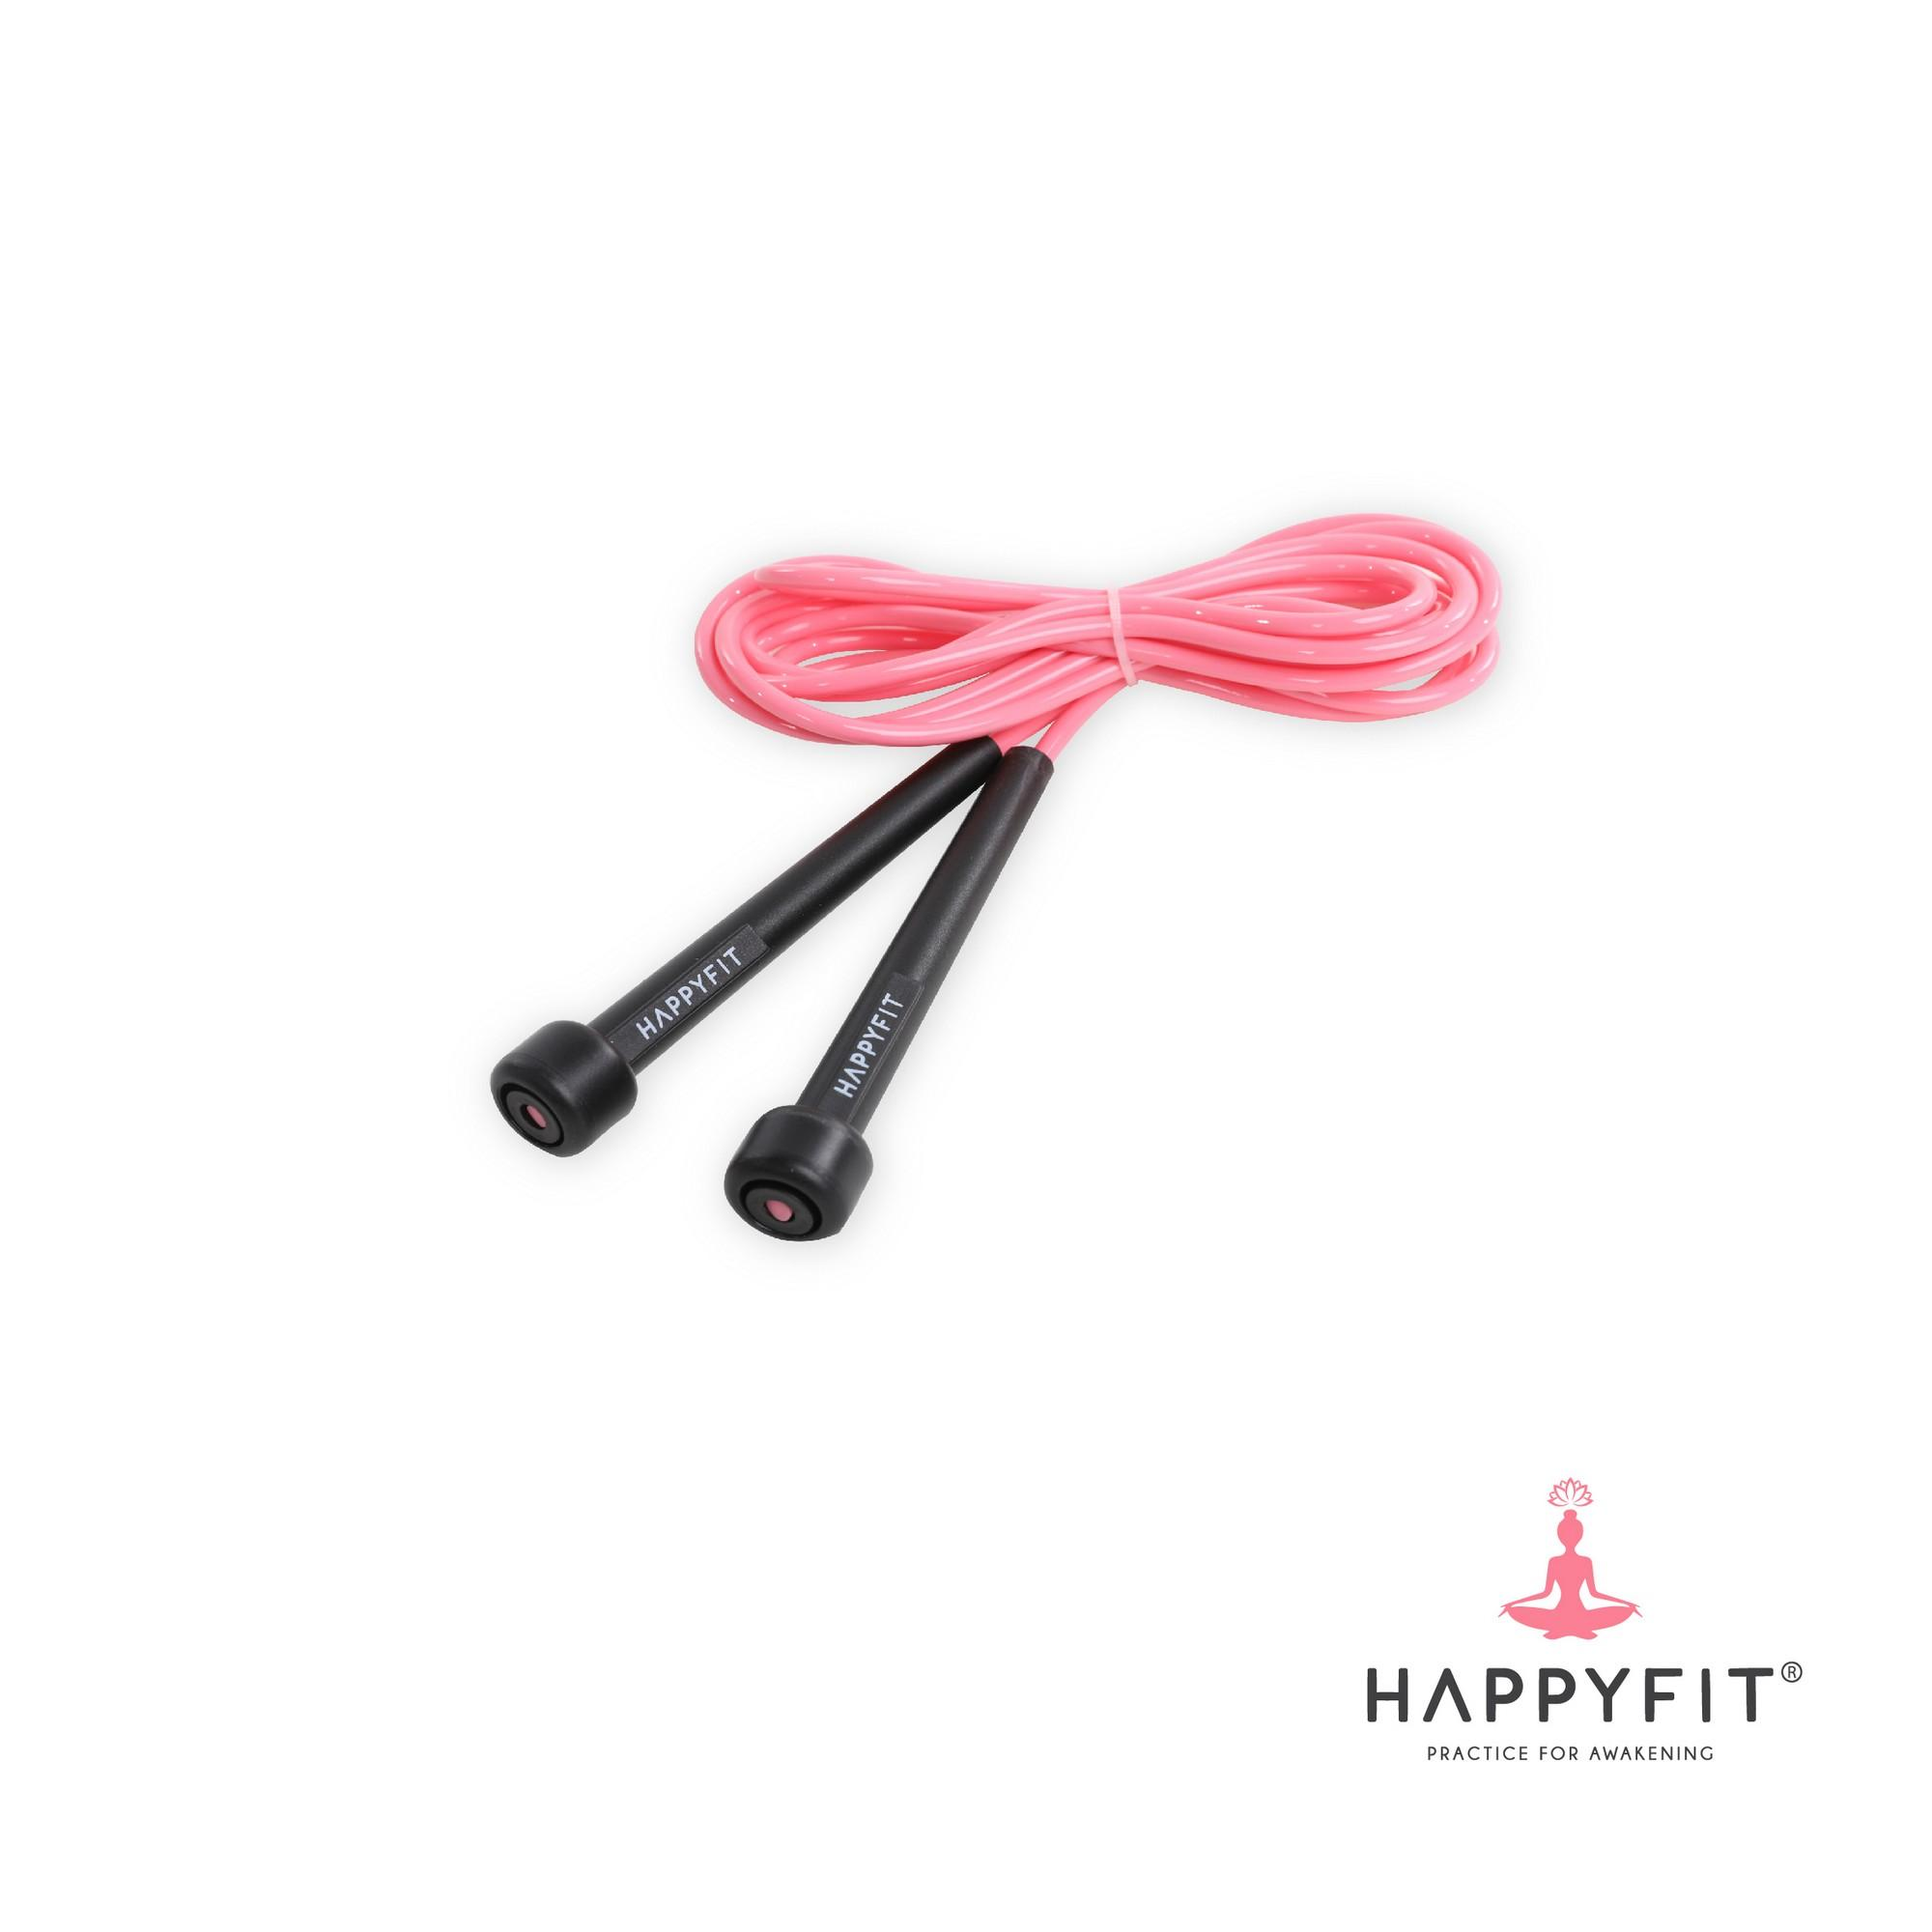 HAPPYFIT JUMP ROPE / LOMPAT TALI - Pink